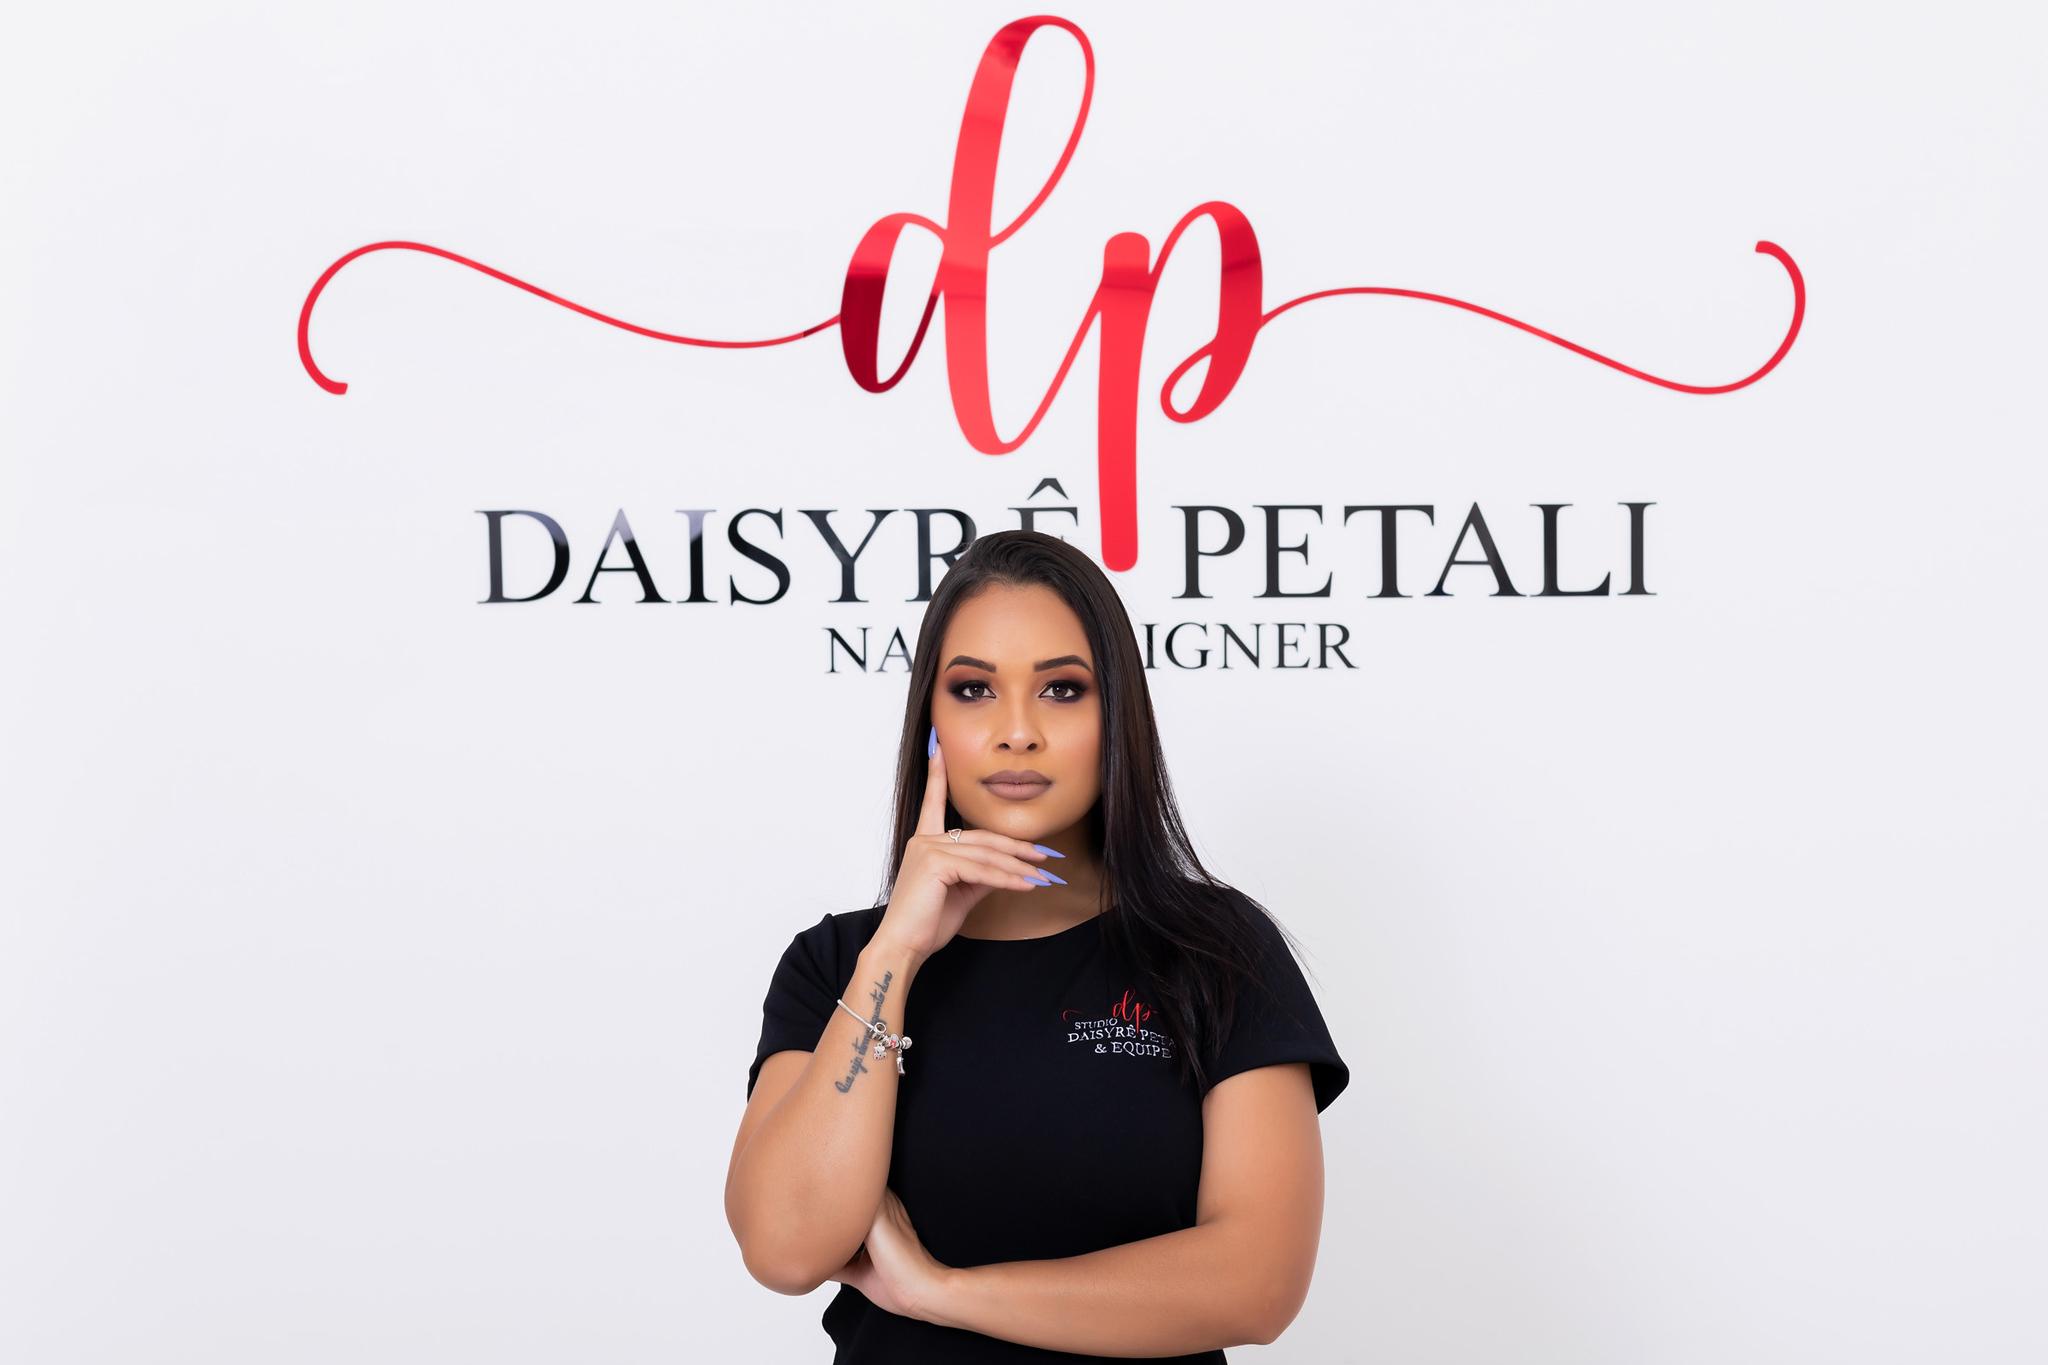 Nail Designer Deisyrê Petalis